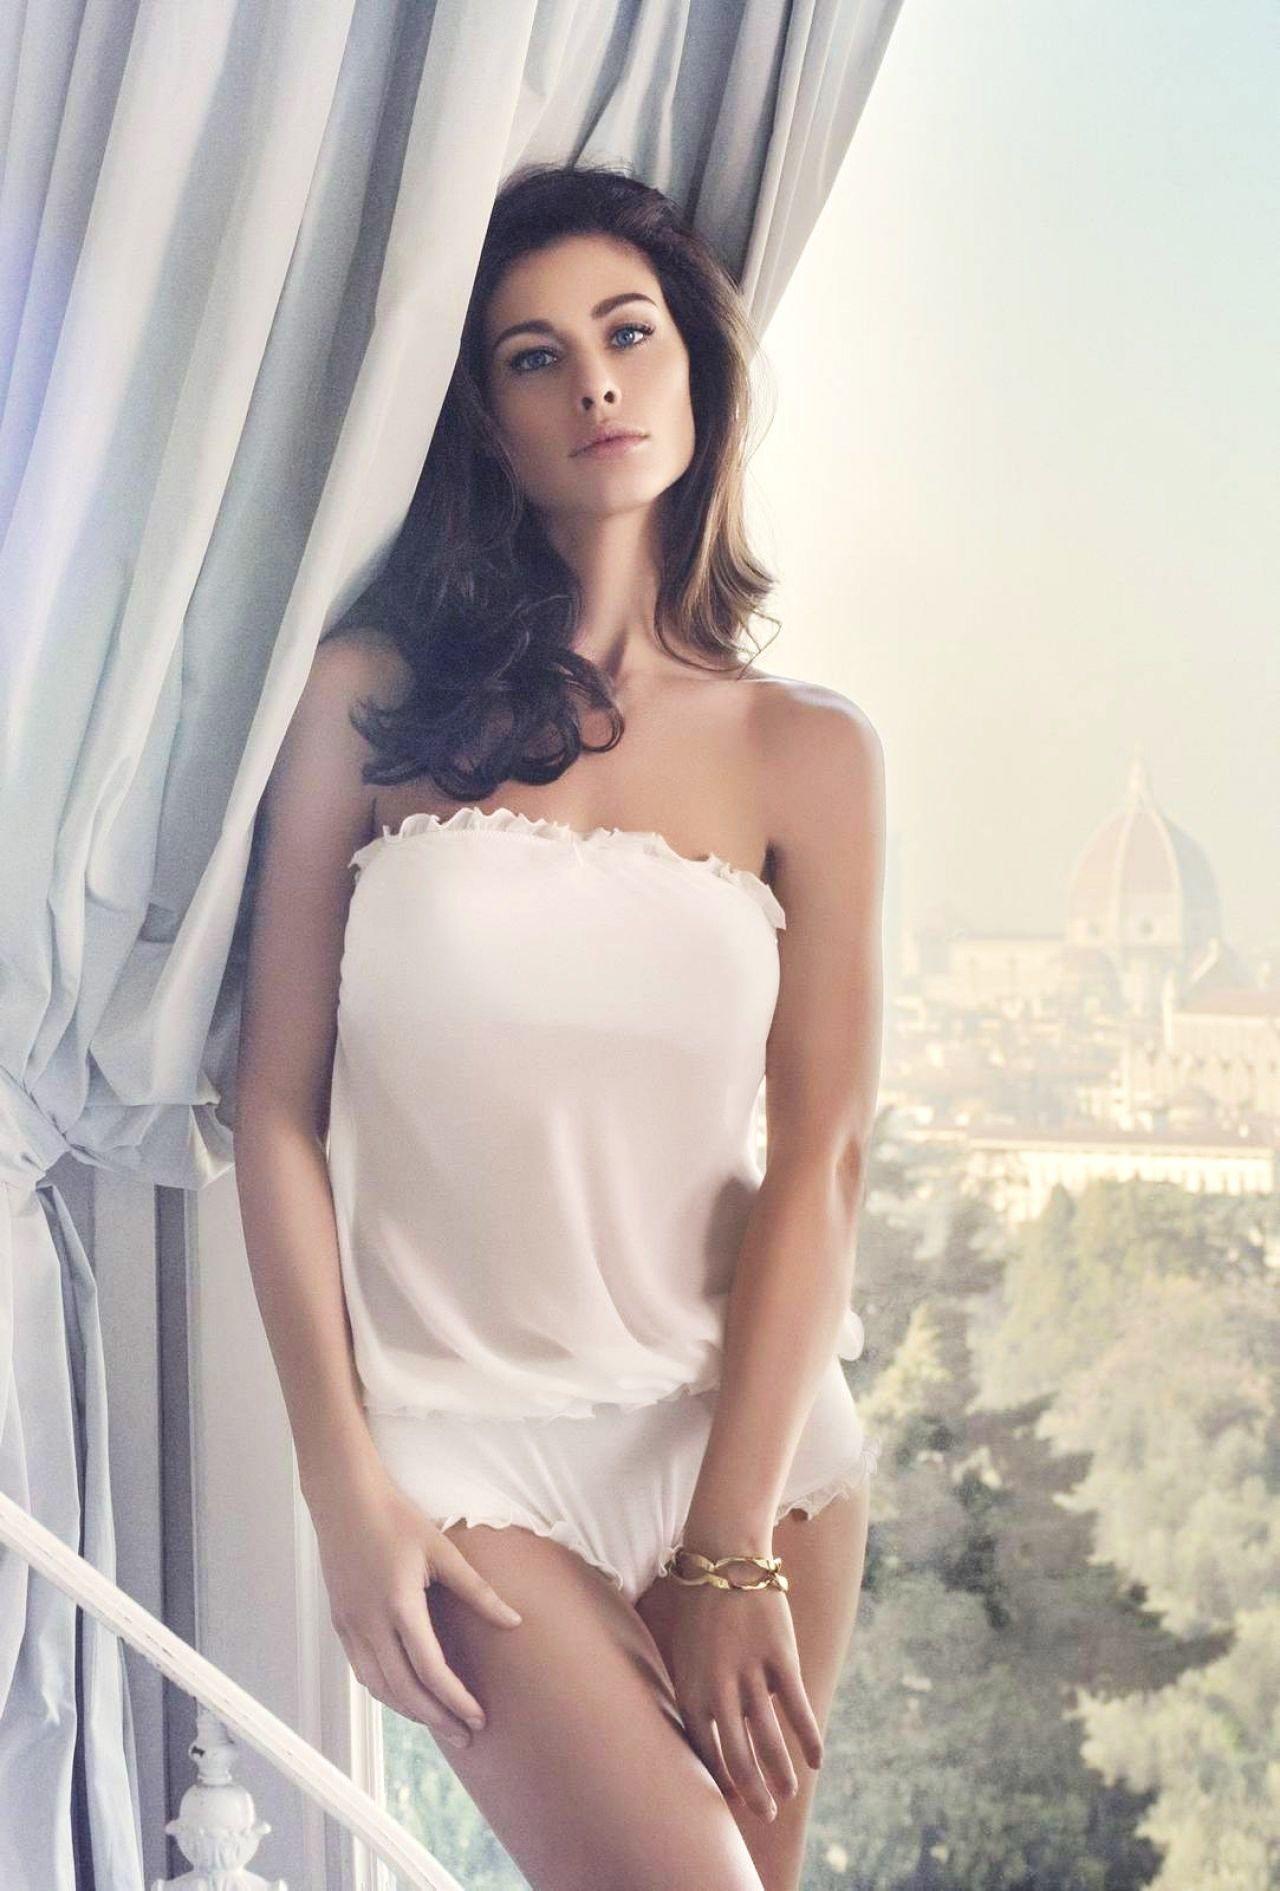 butt Hacked Marica Pellegrinelli naked photo 2017